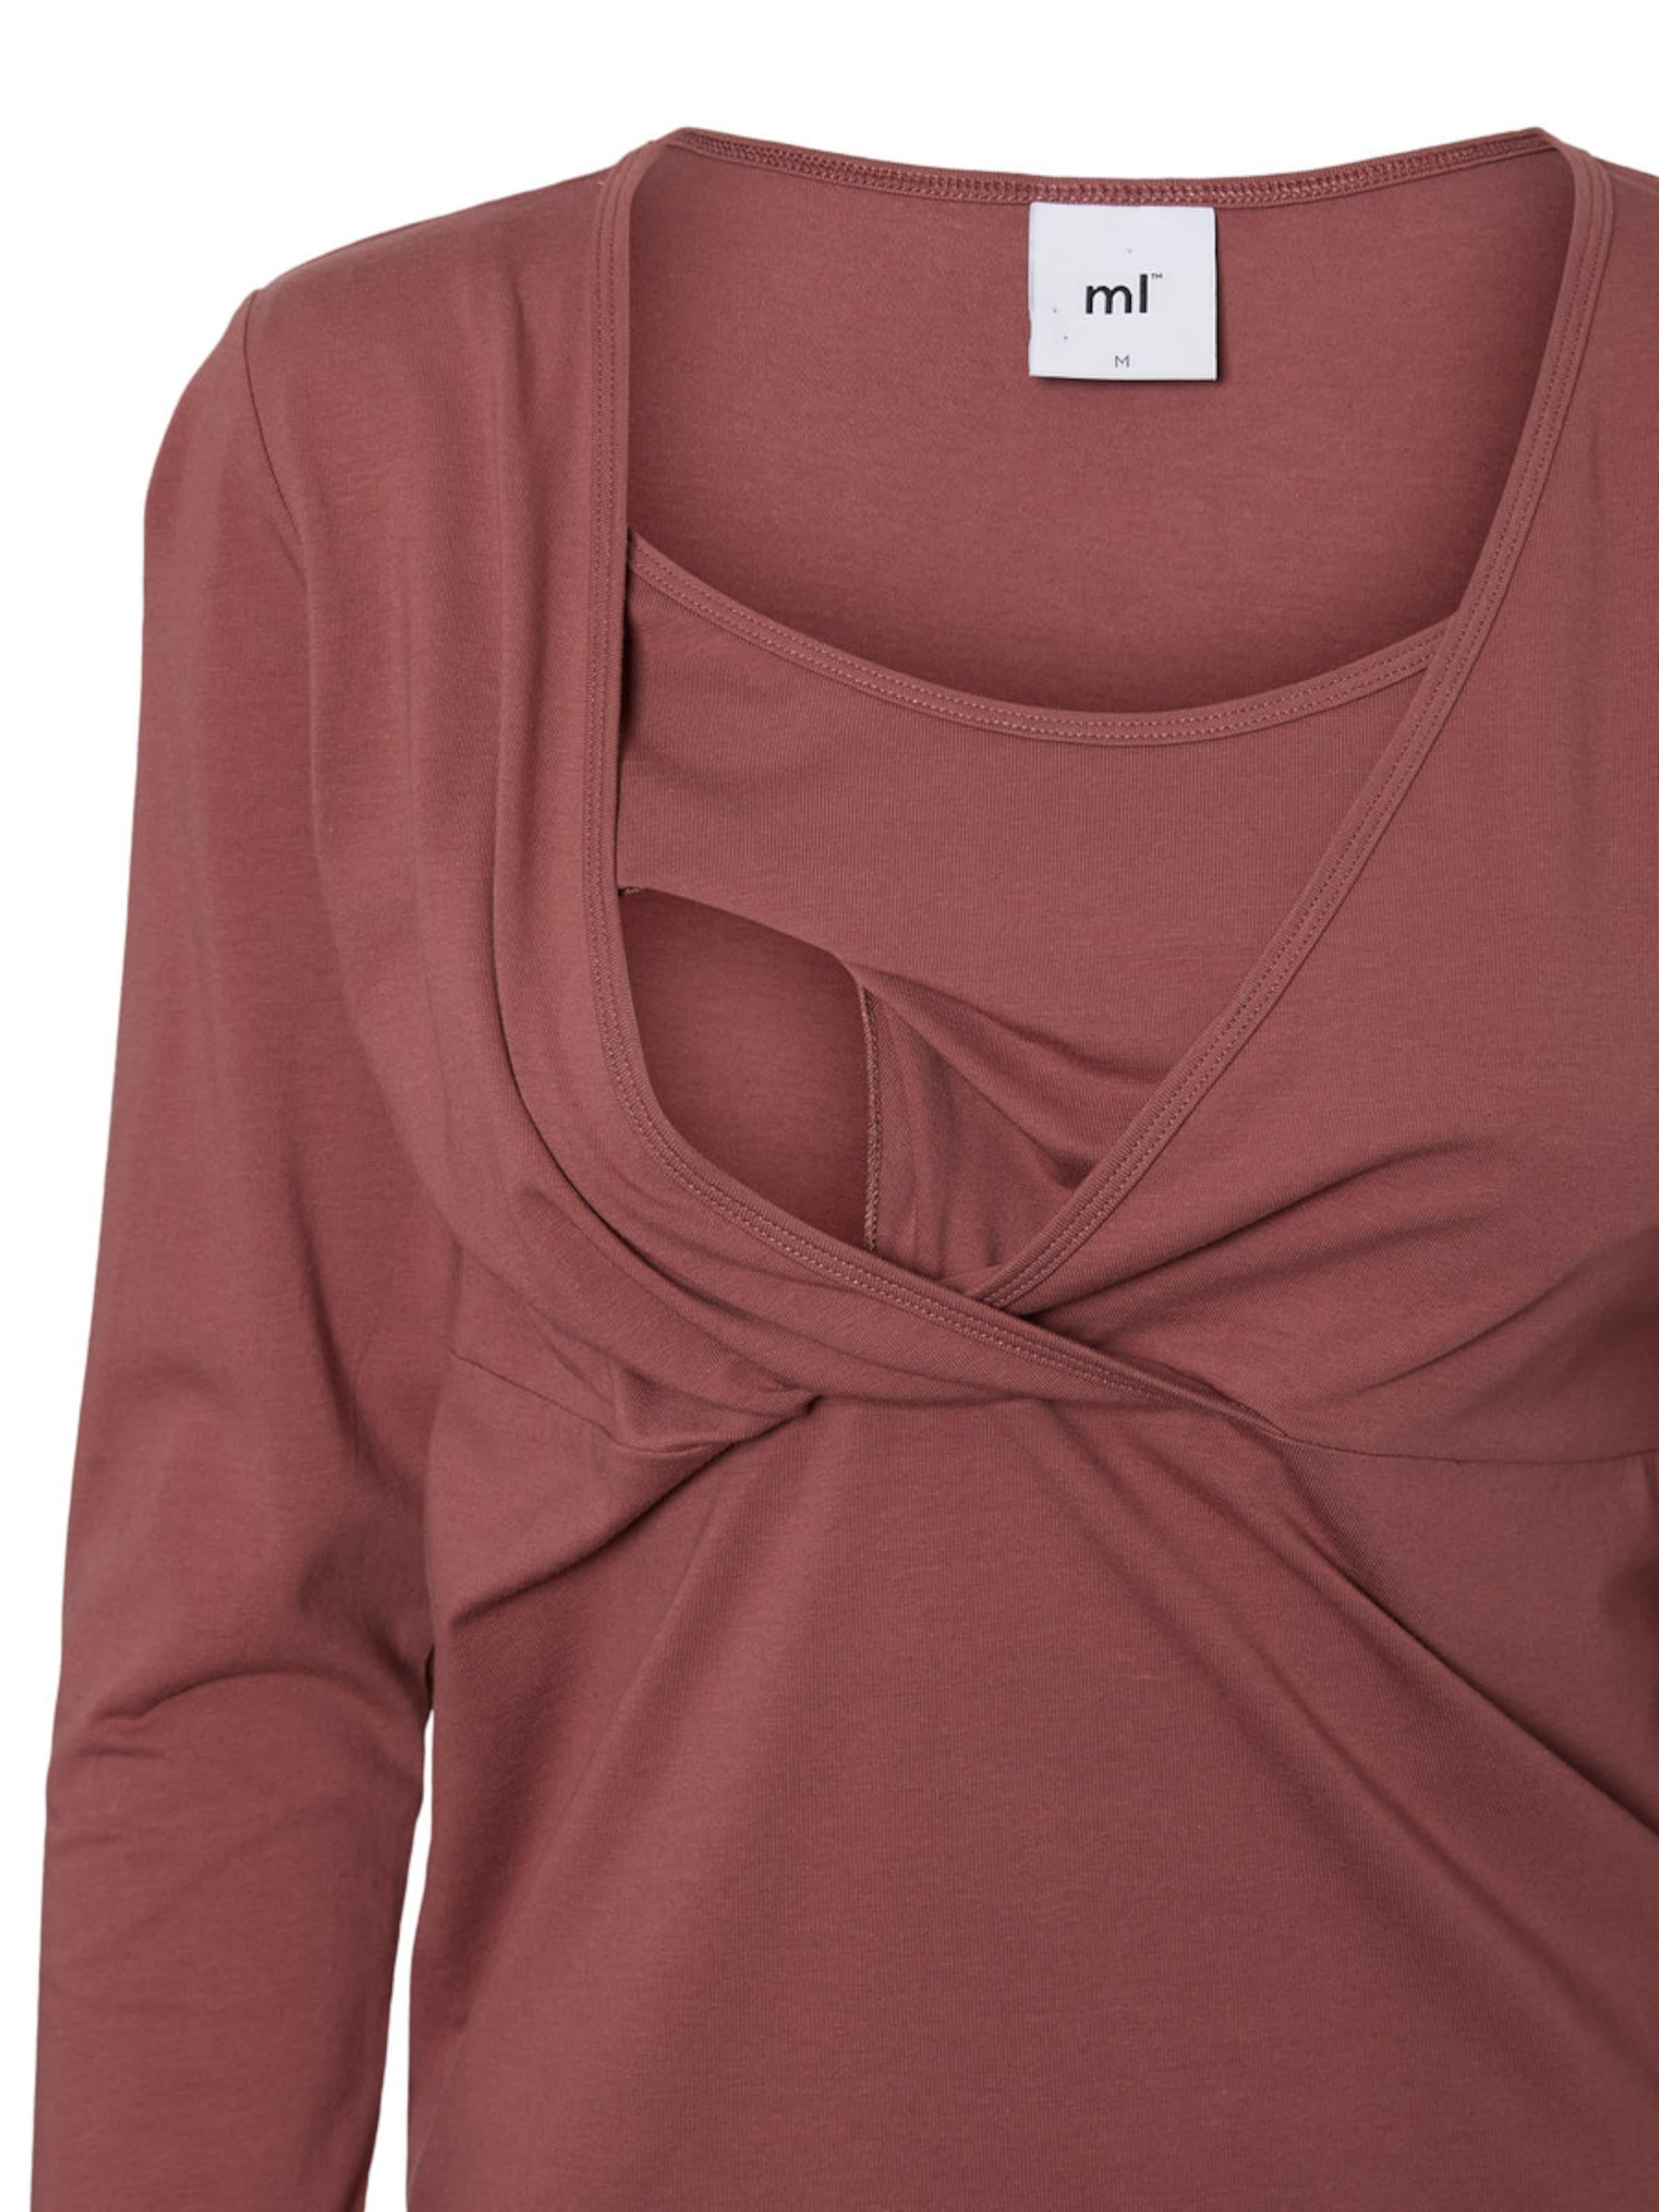 shirt En Mamalicious Rouge PastelBlanc T UVqSzMpG